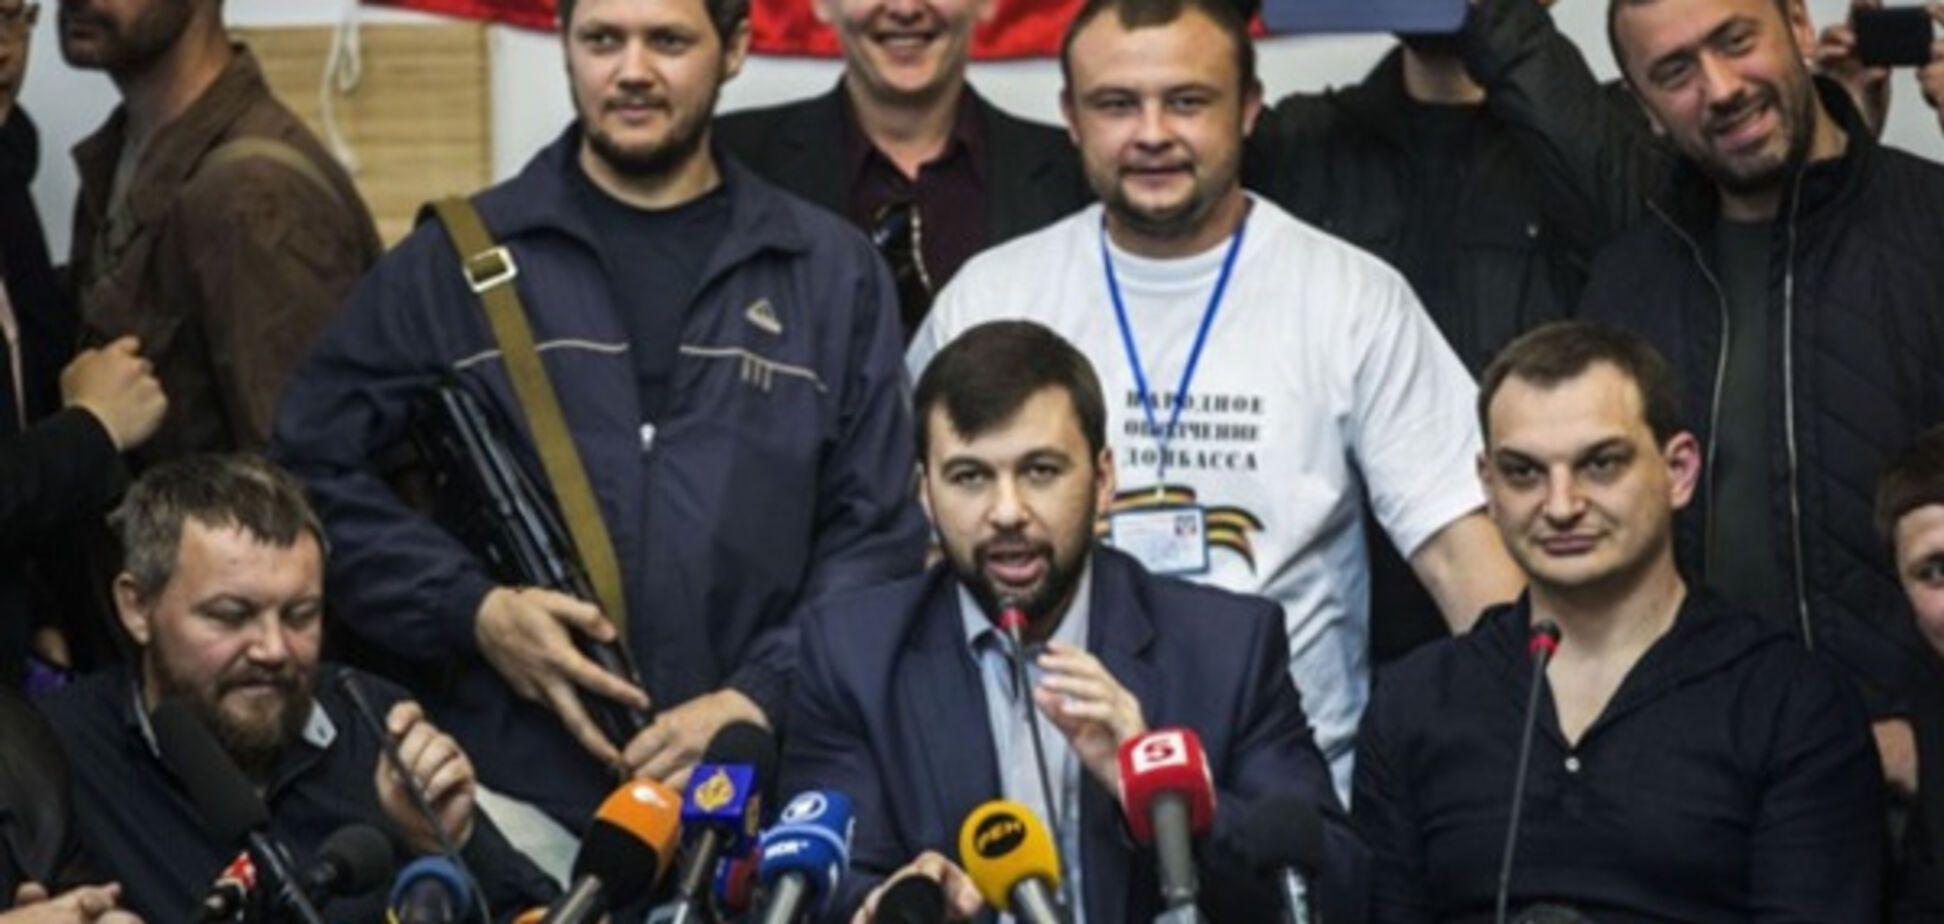 сепаратисти України